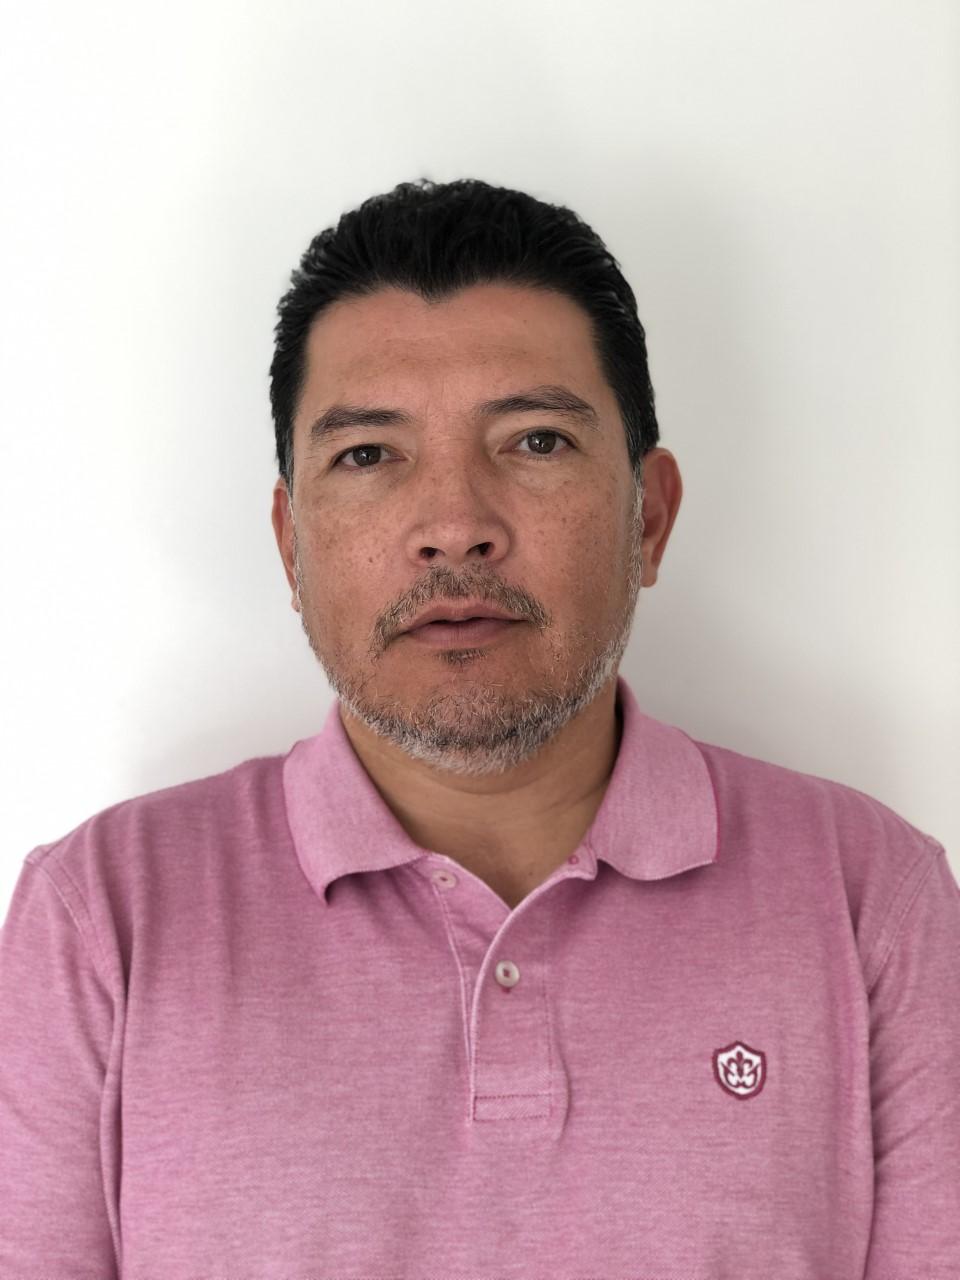 CPEF-T1A0620 -Carlos Alberto Cabanillas Quintero